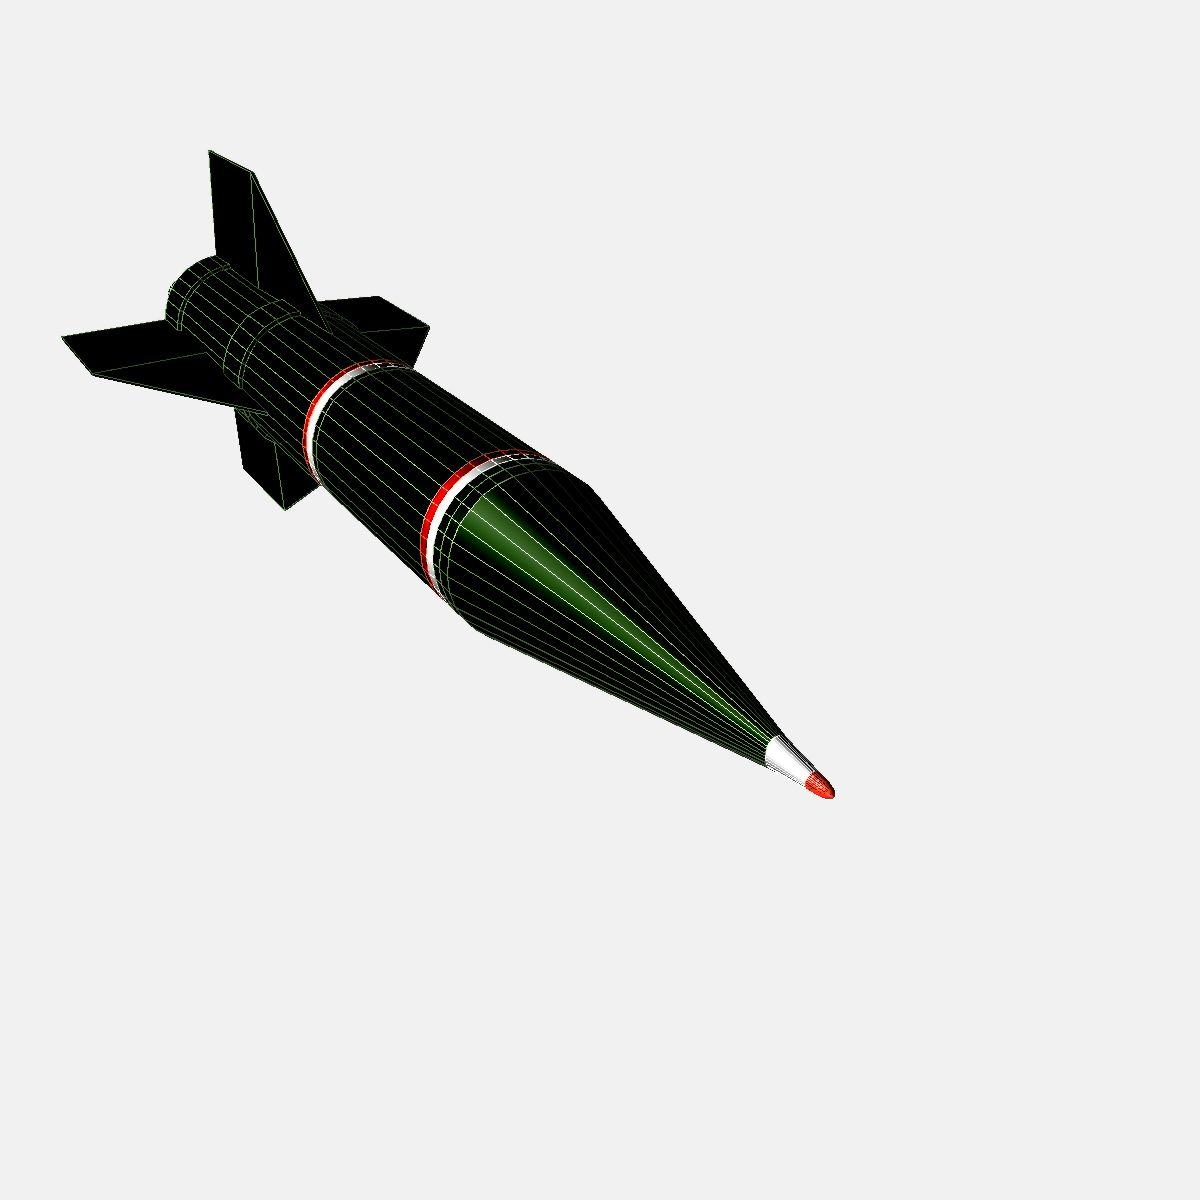 iranian shahin i 3d model 3ds dxf fbx blend cob dae x  obj 202190